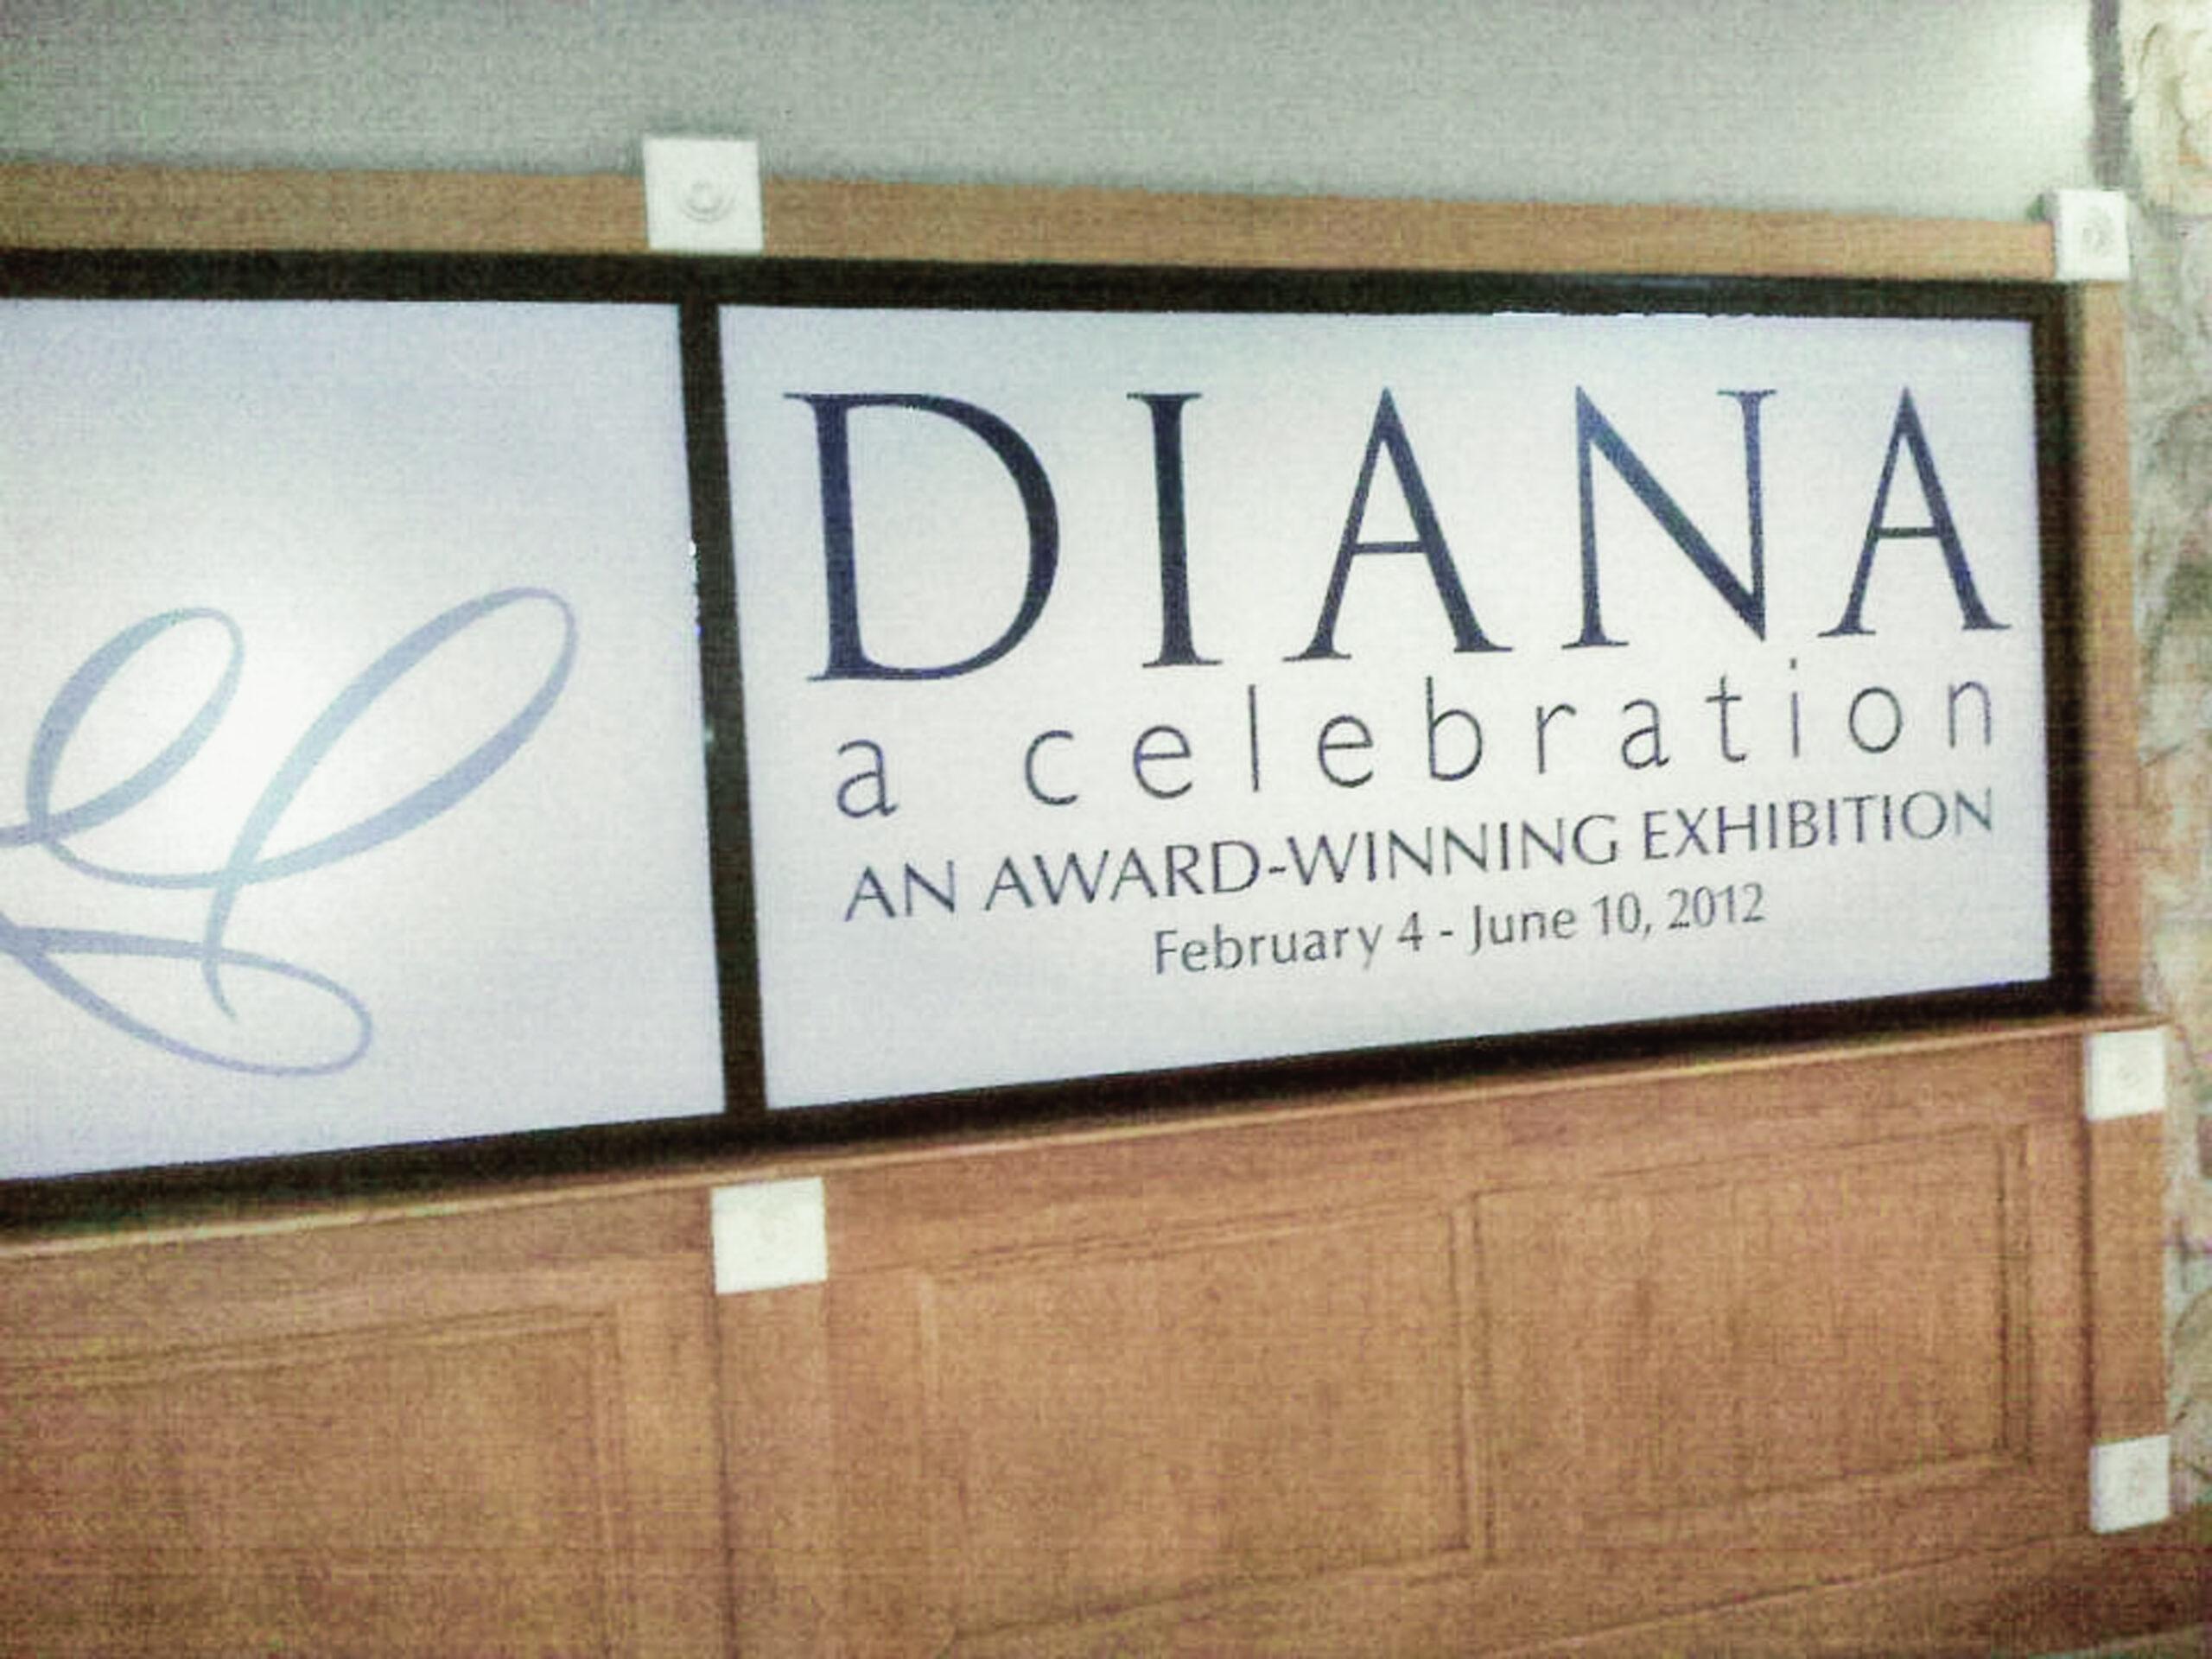 Princess Diana gowns exhibit